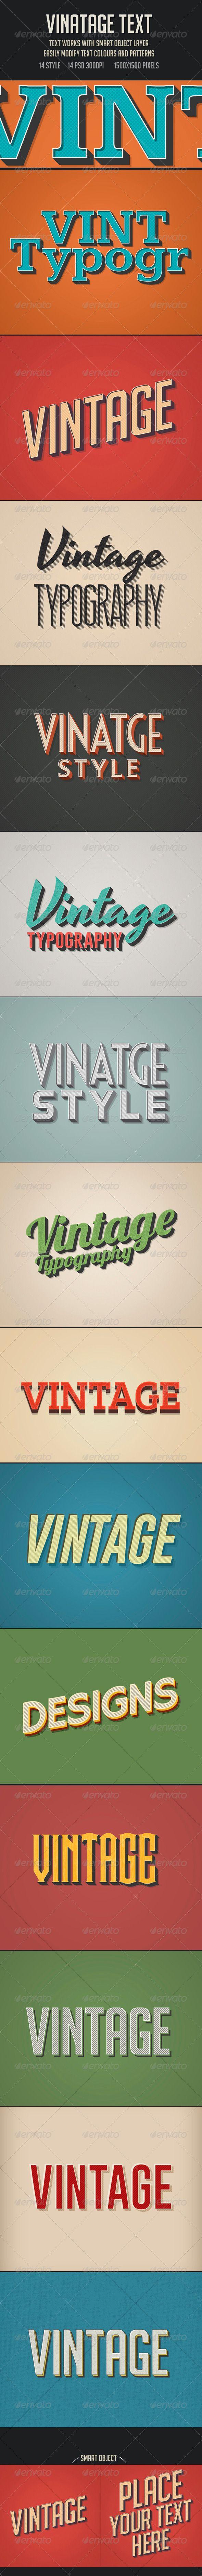 Vintage/Retro Text